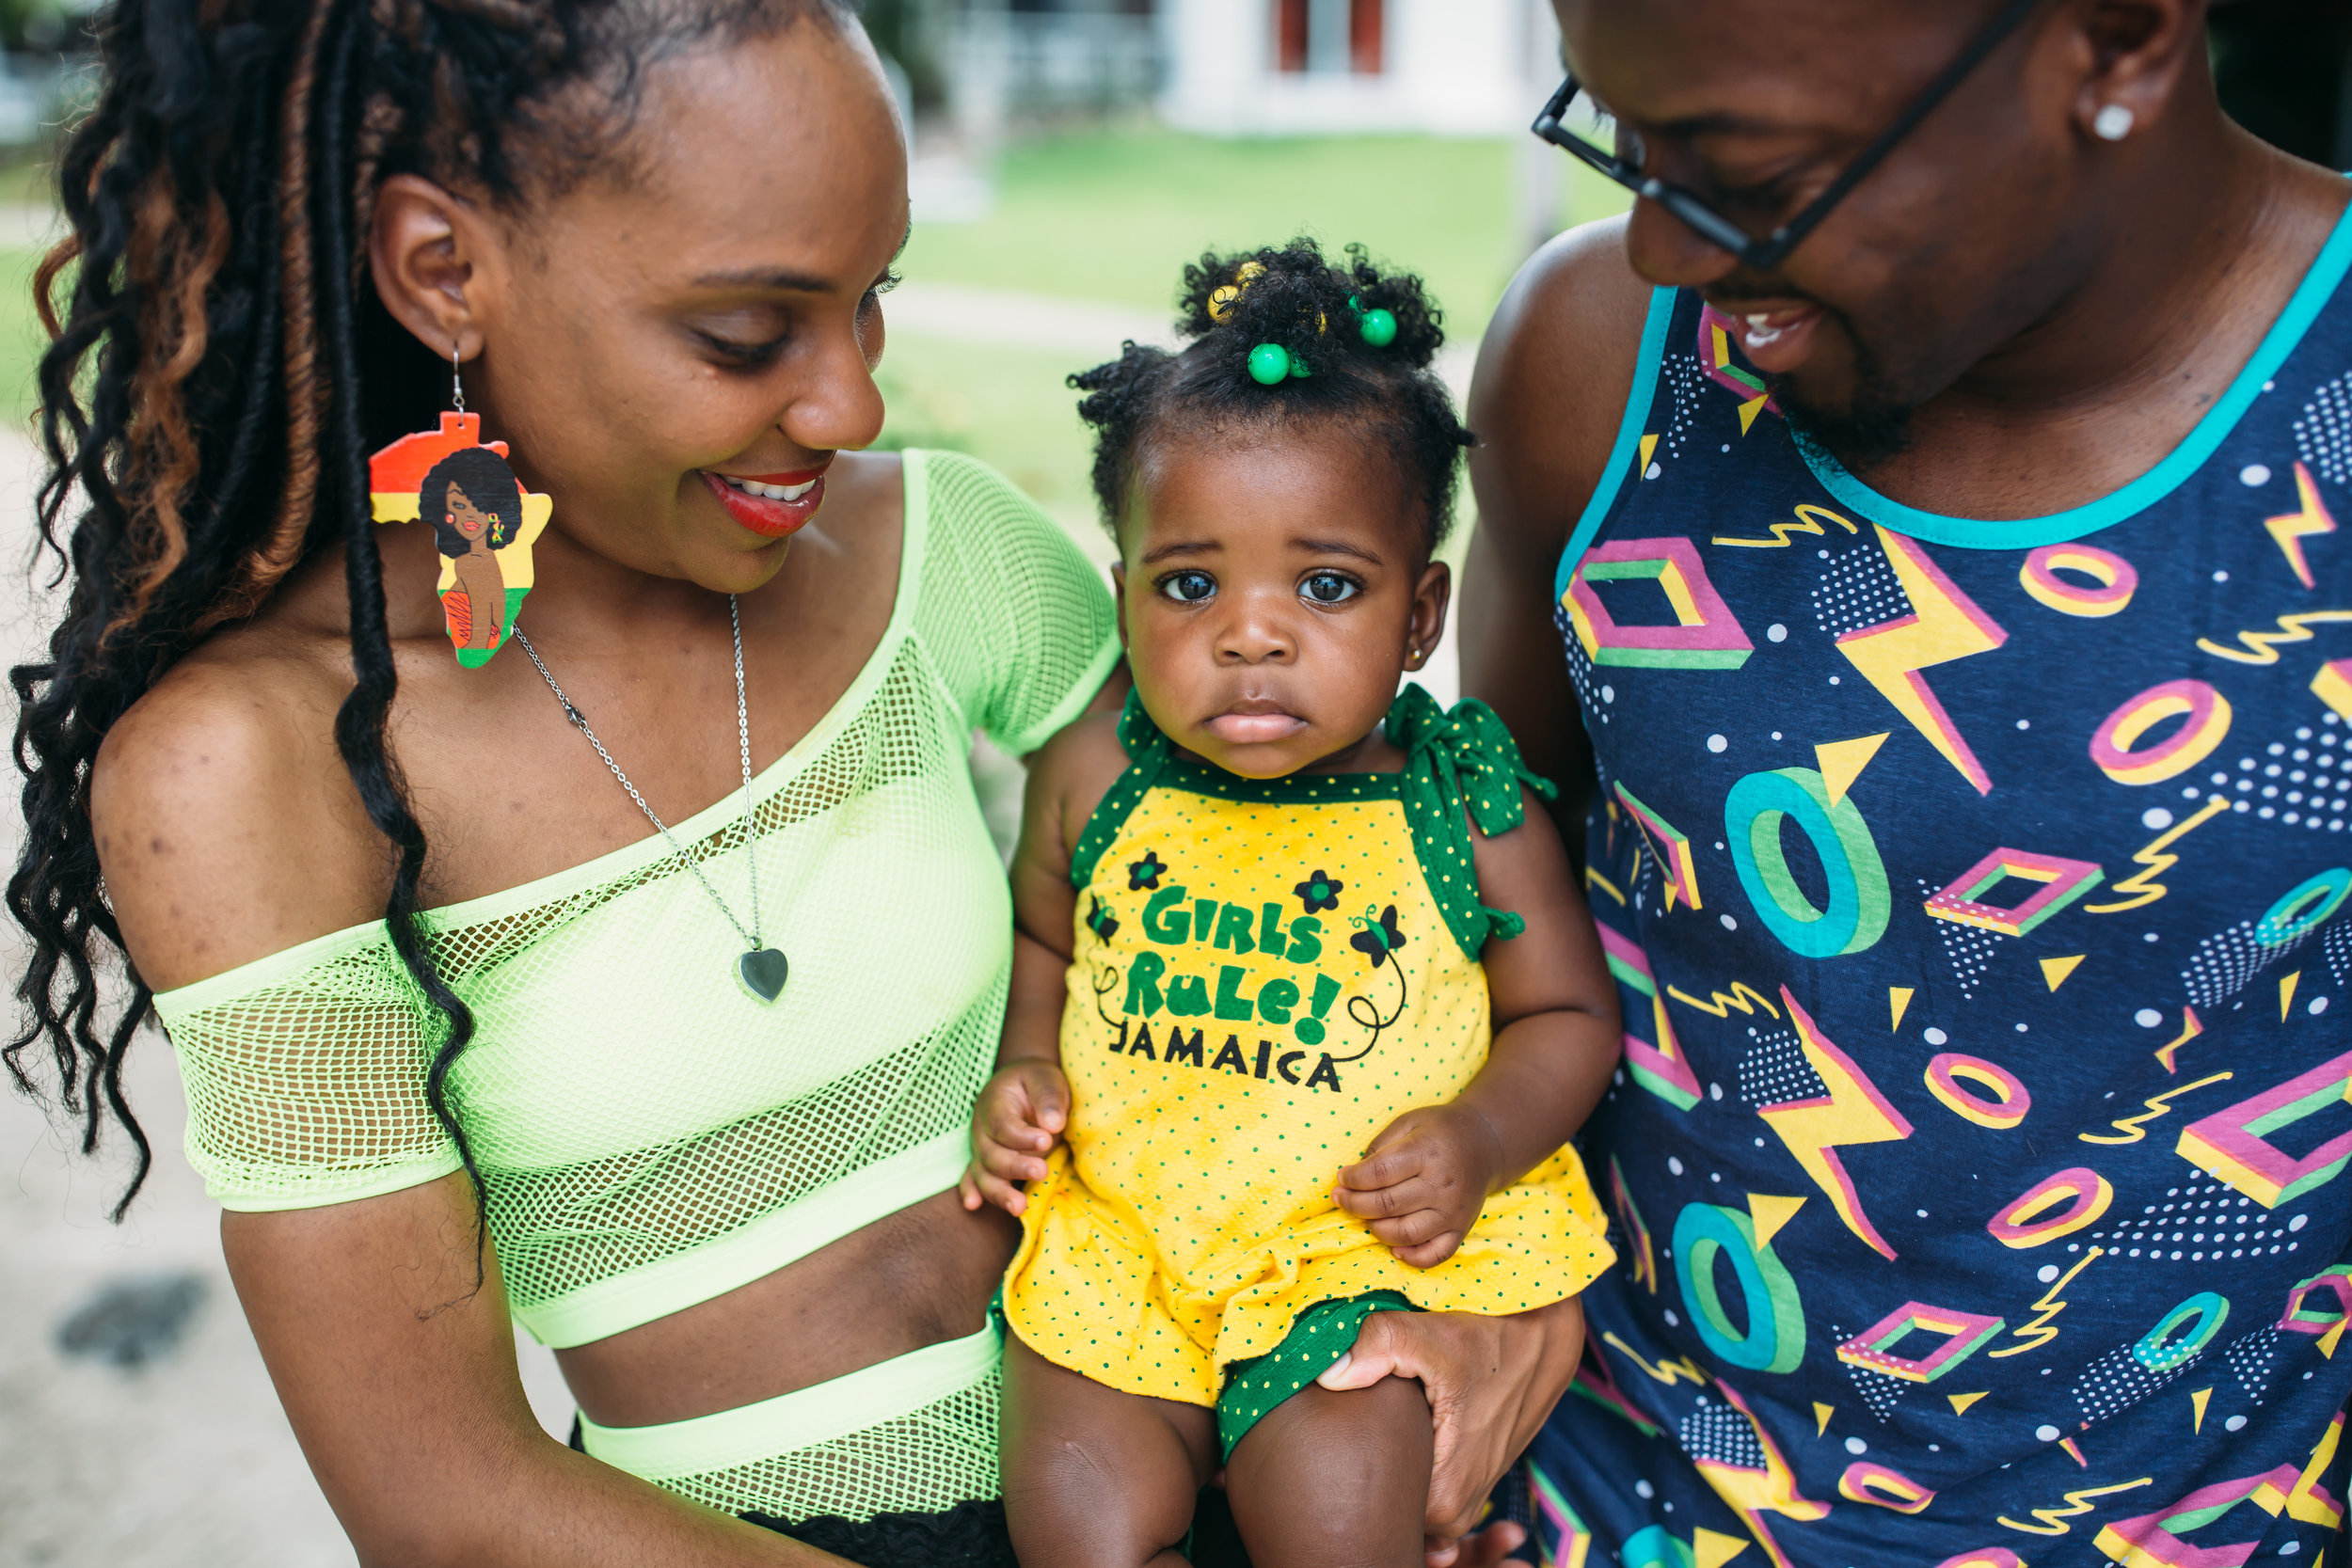 Jamaica_Family_61719-7.jpg